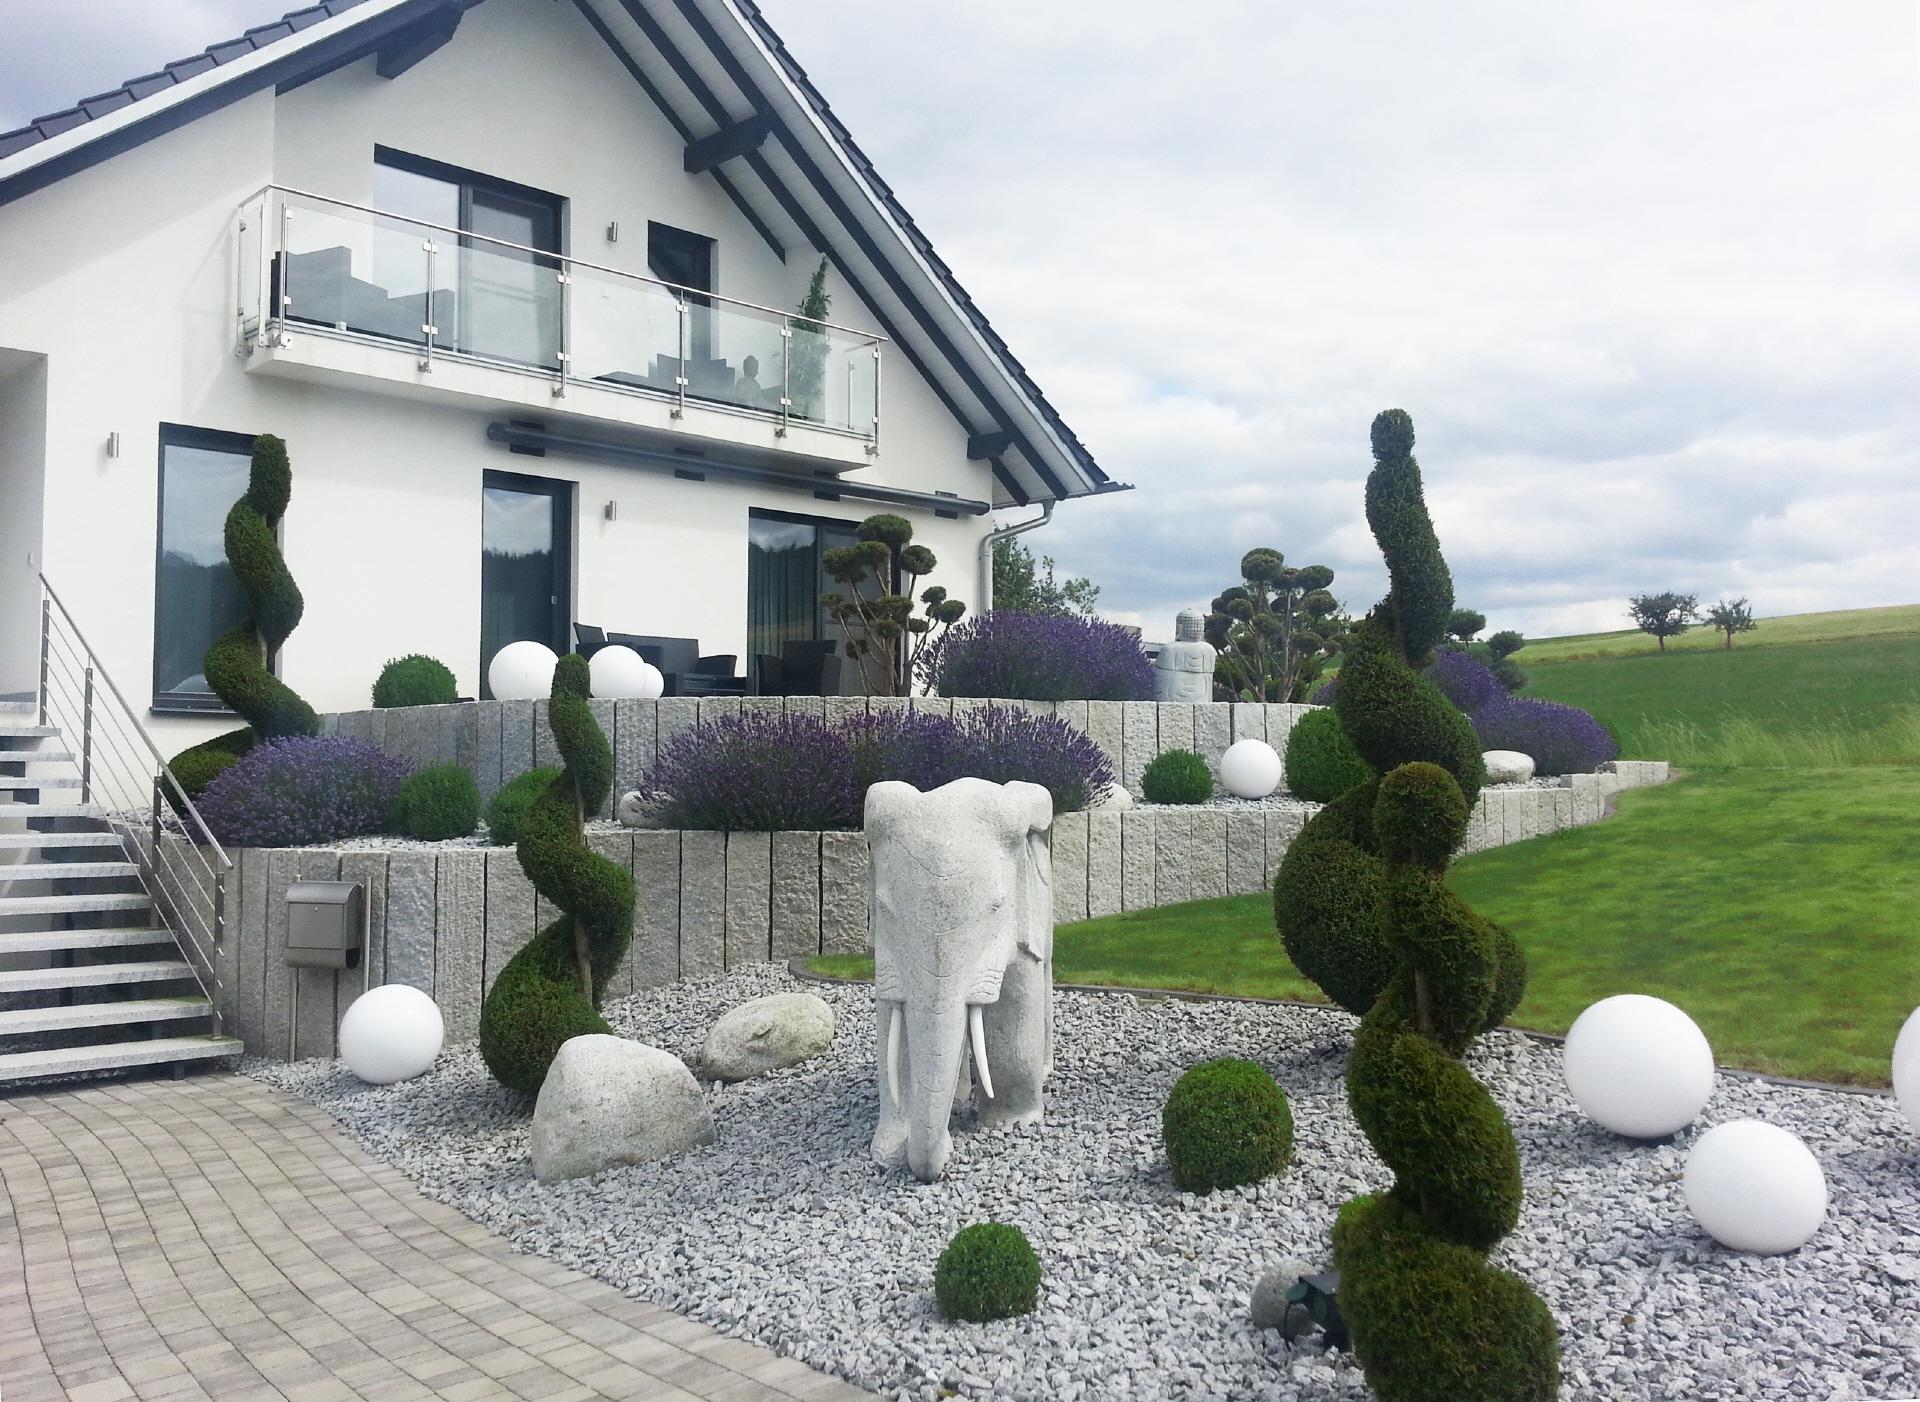 Moderner Garten. Best Moderner Garten With Moderner Garten. Best ...